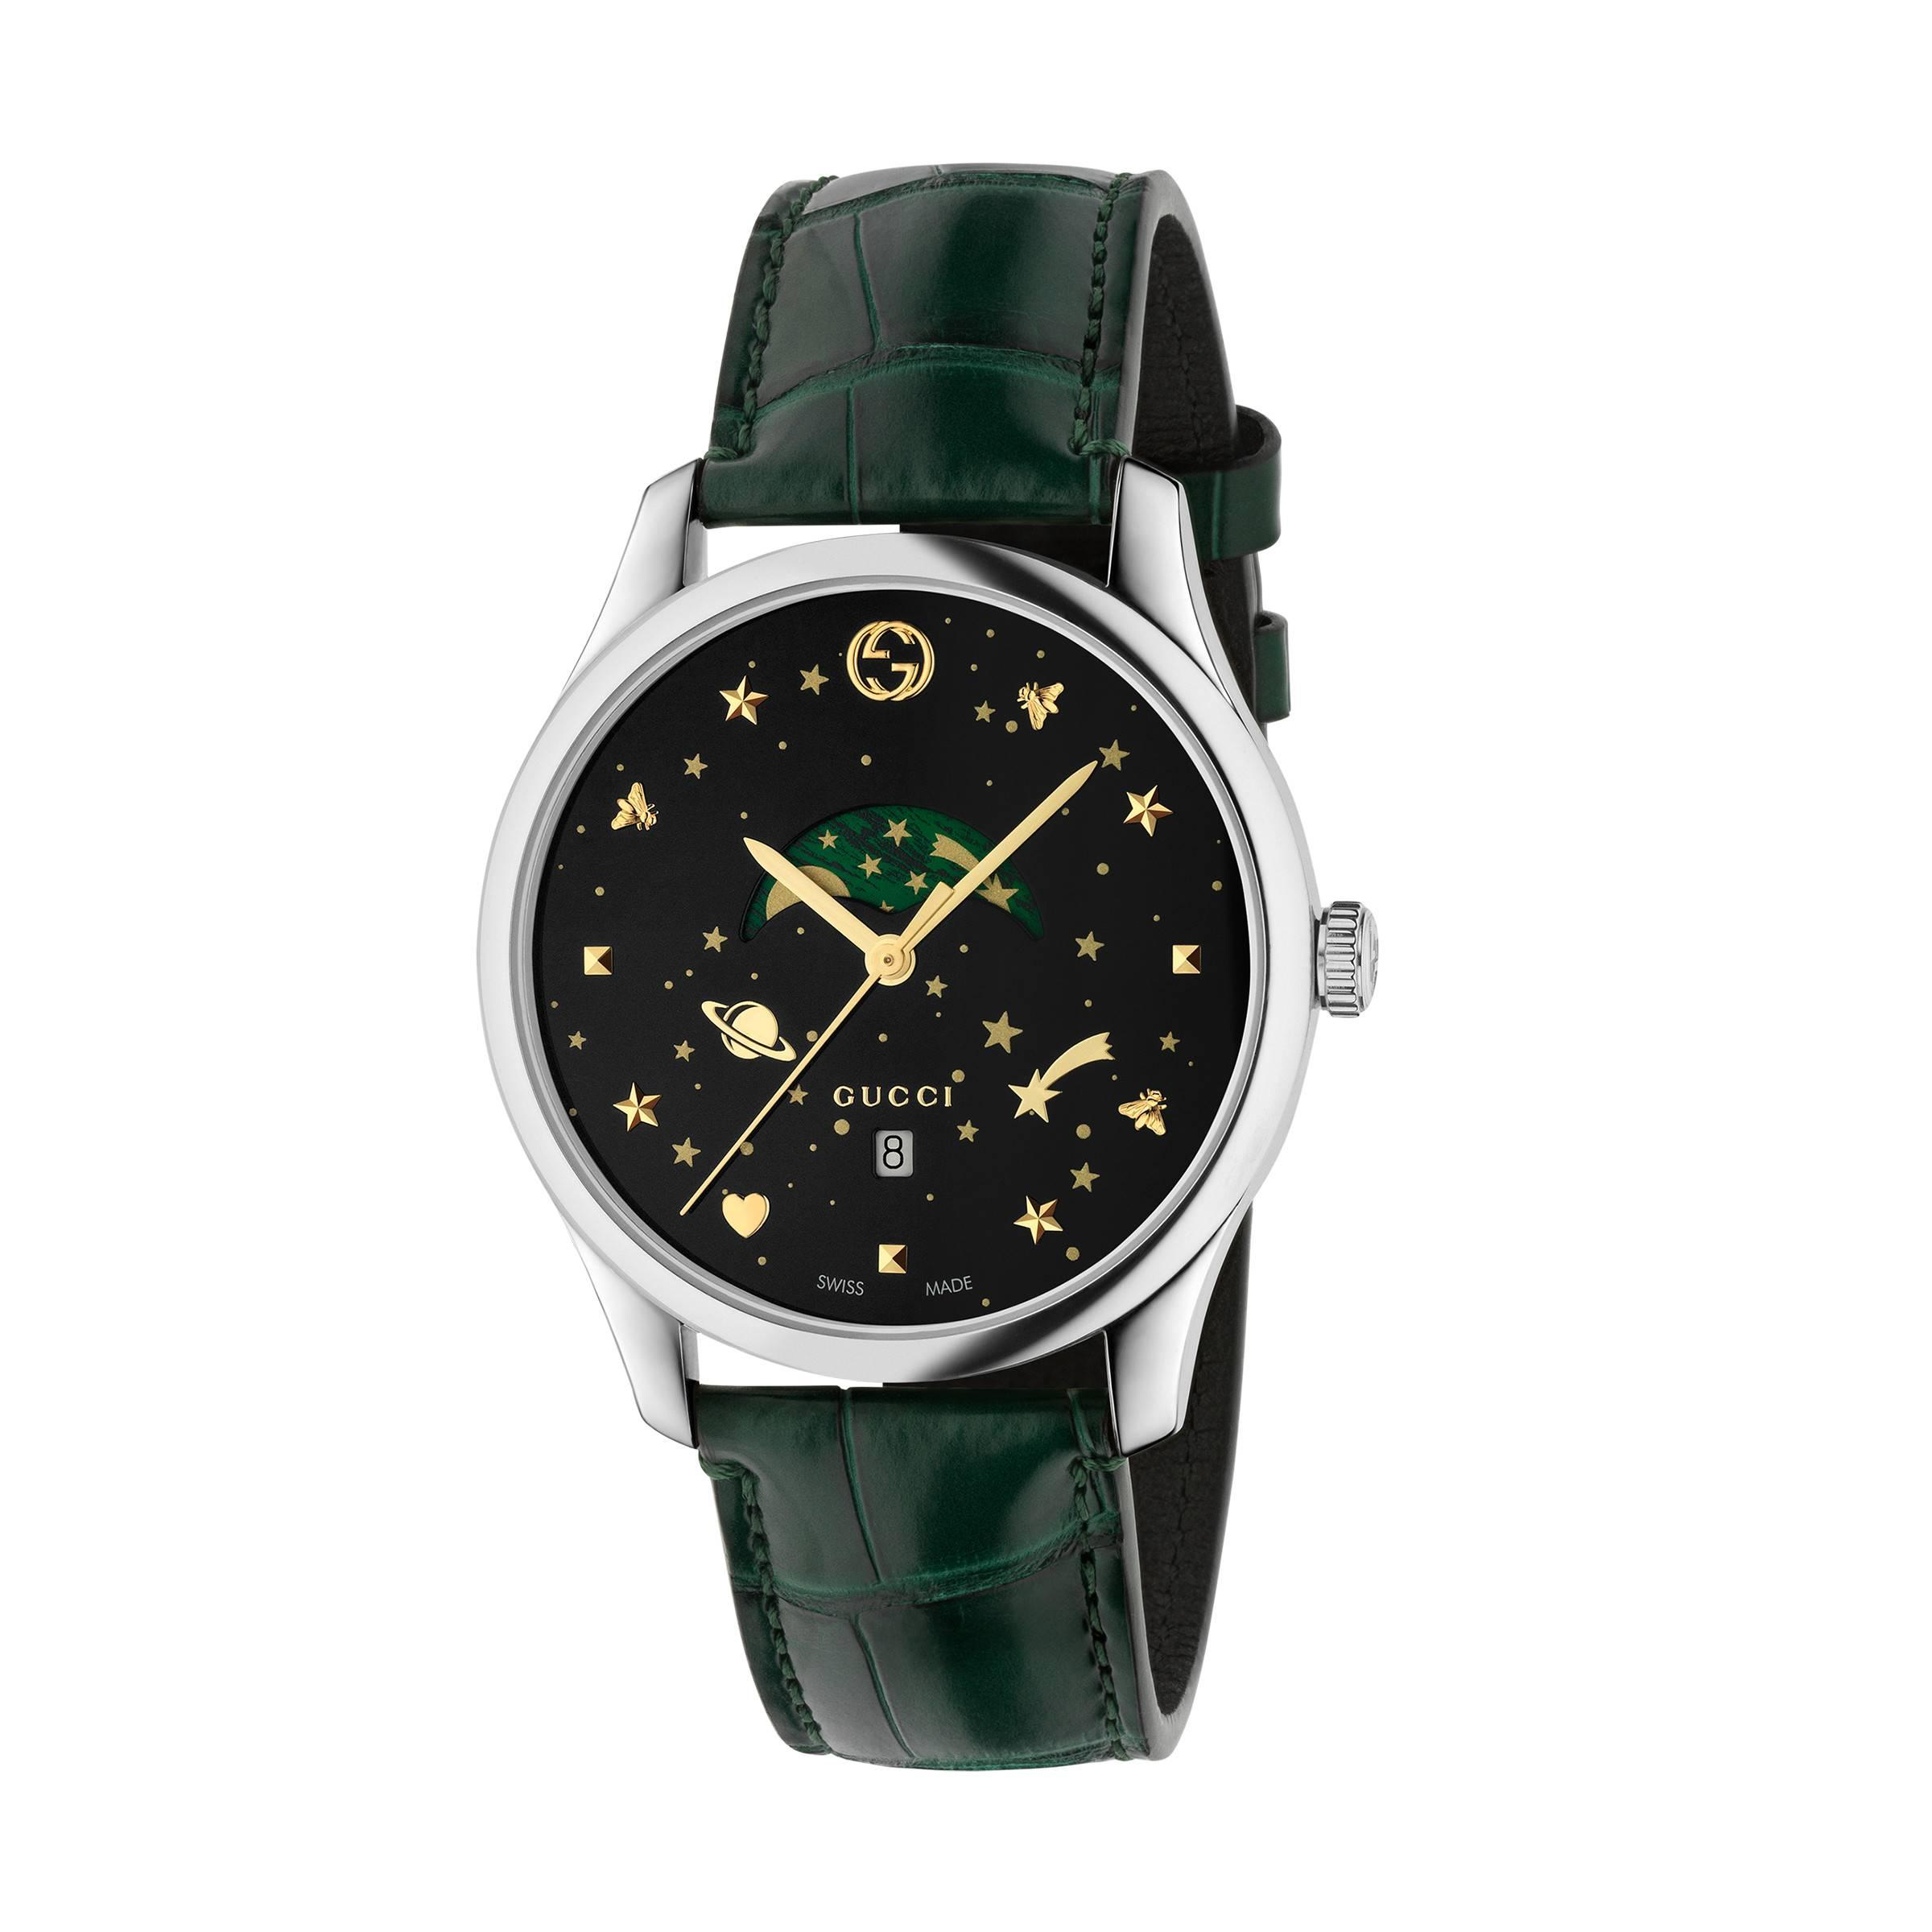 f9c79c59f6 Reloj G-Timeless, 40mm Gucci de hombre - Lyst